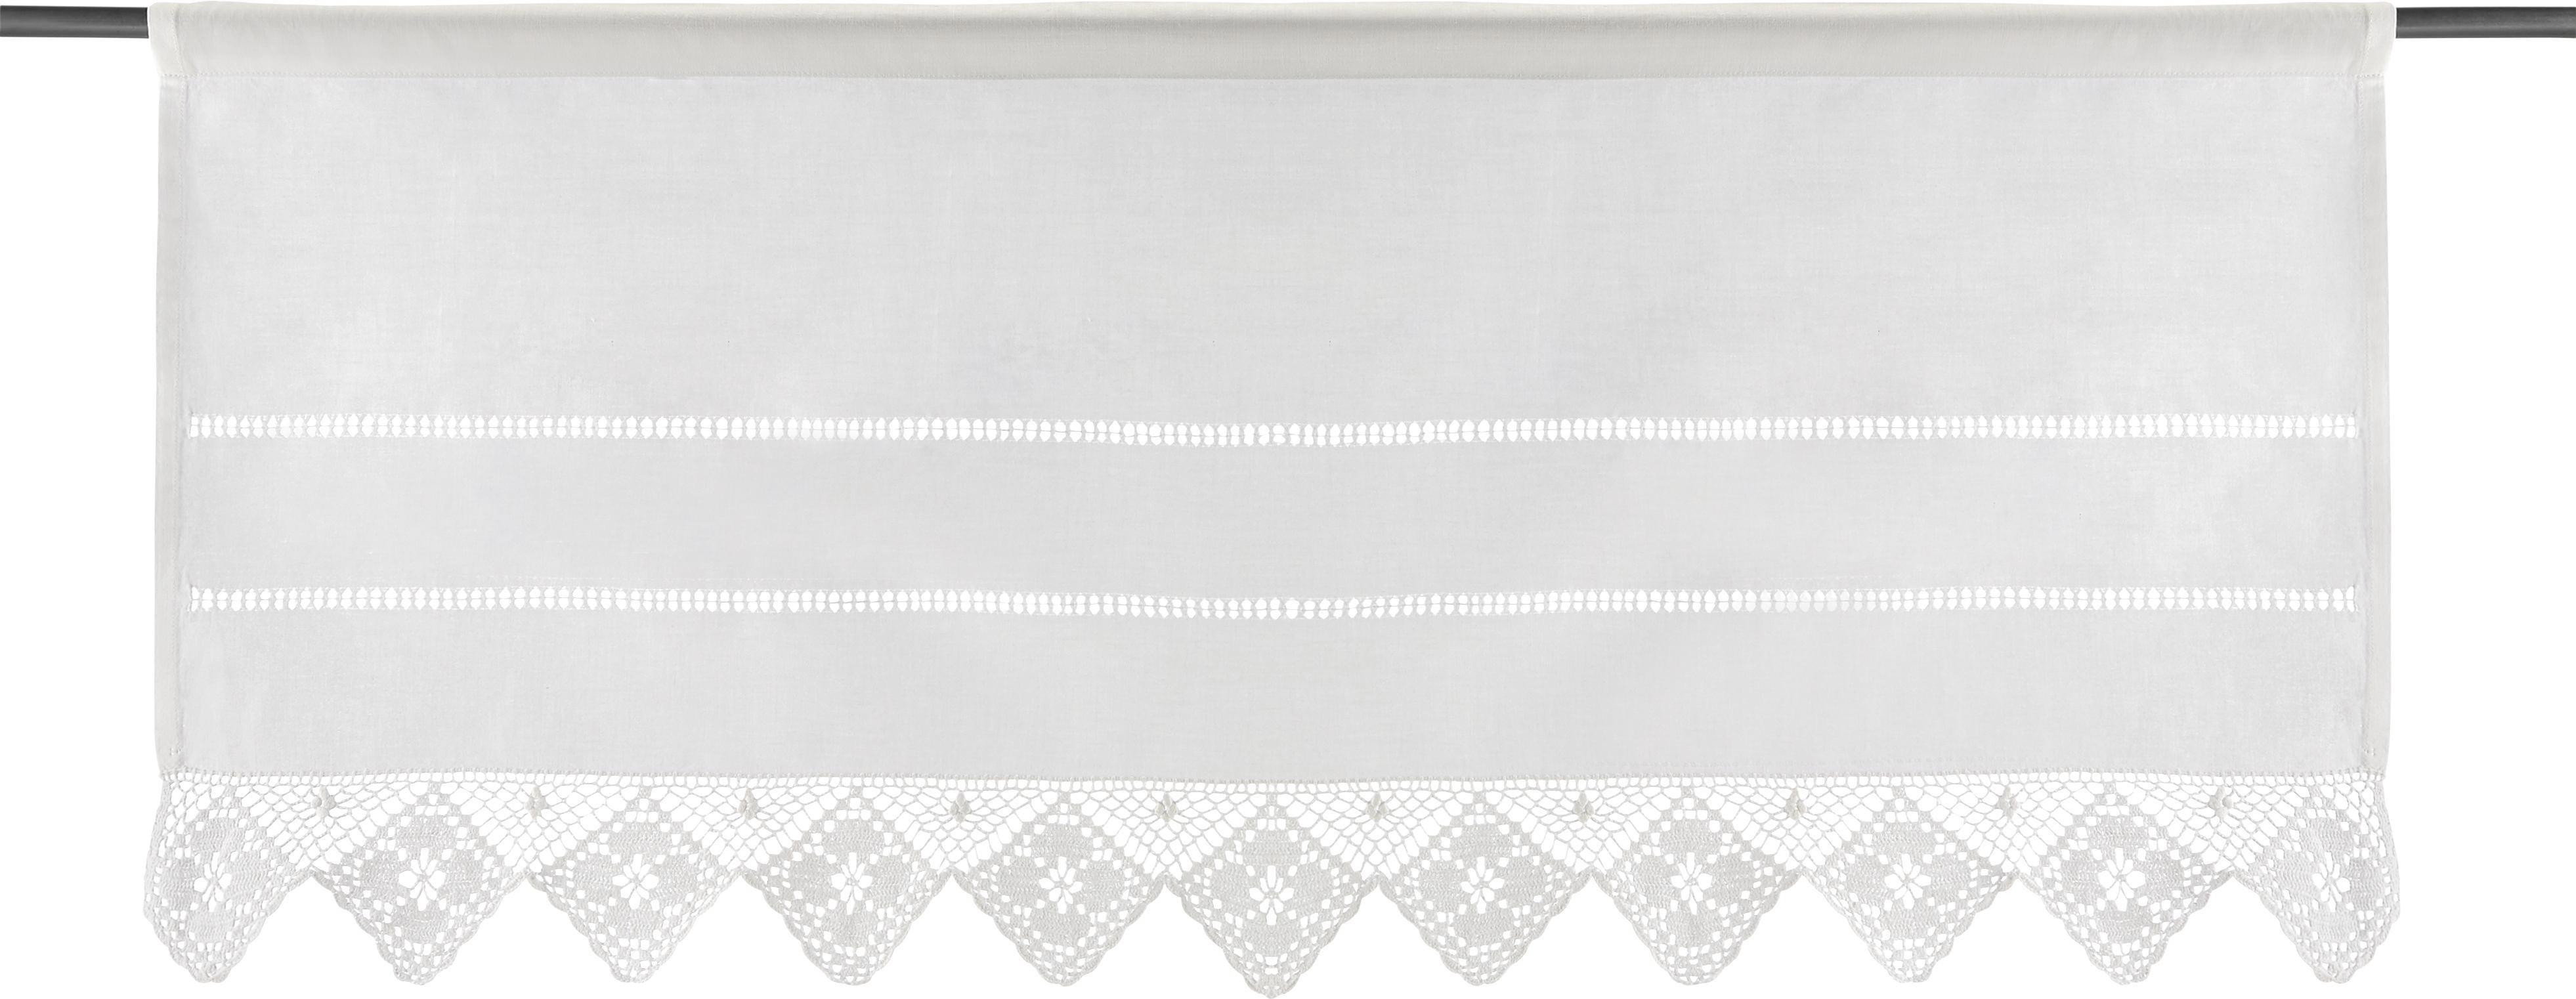 Kurzgardine Carmen 45x100cm - Weiß, KONVENTIONELL, Textil (50/100cm) - PREMIUM LIVING